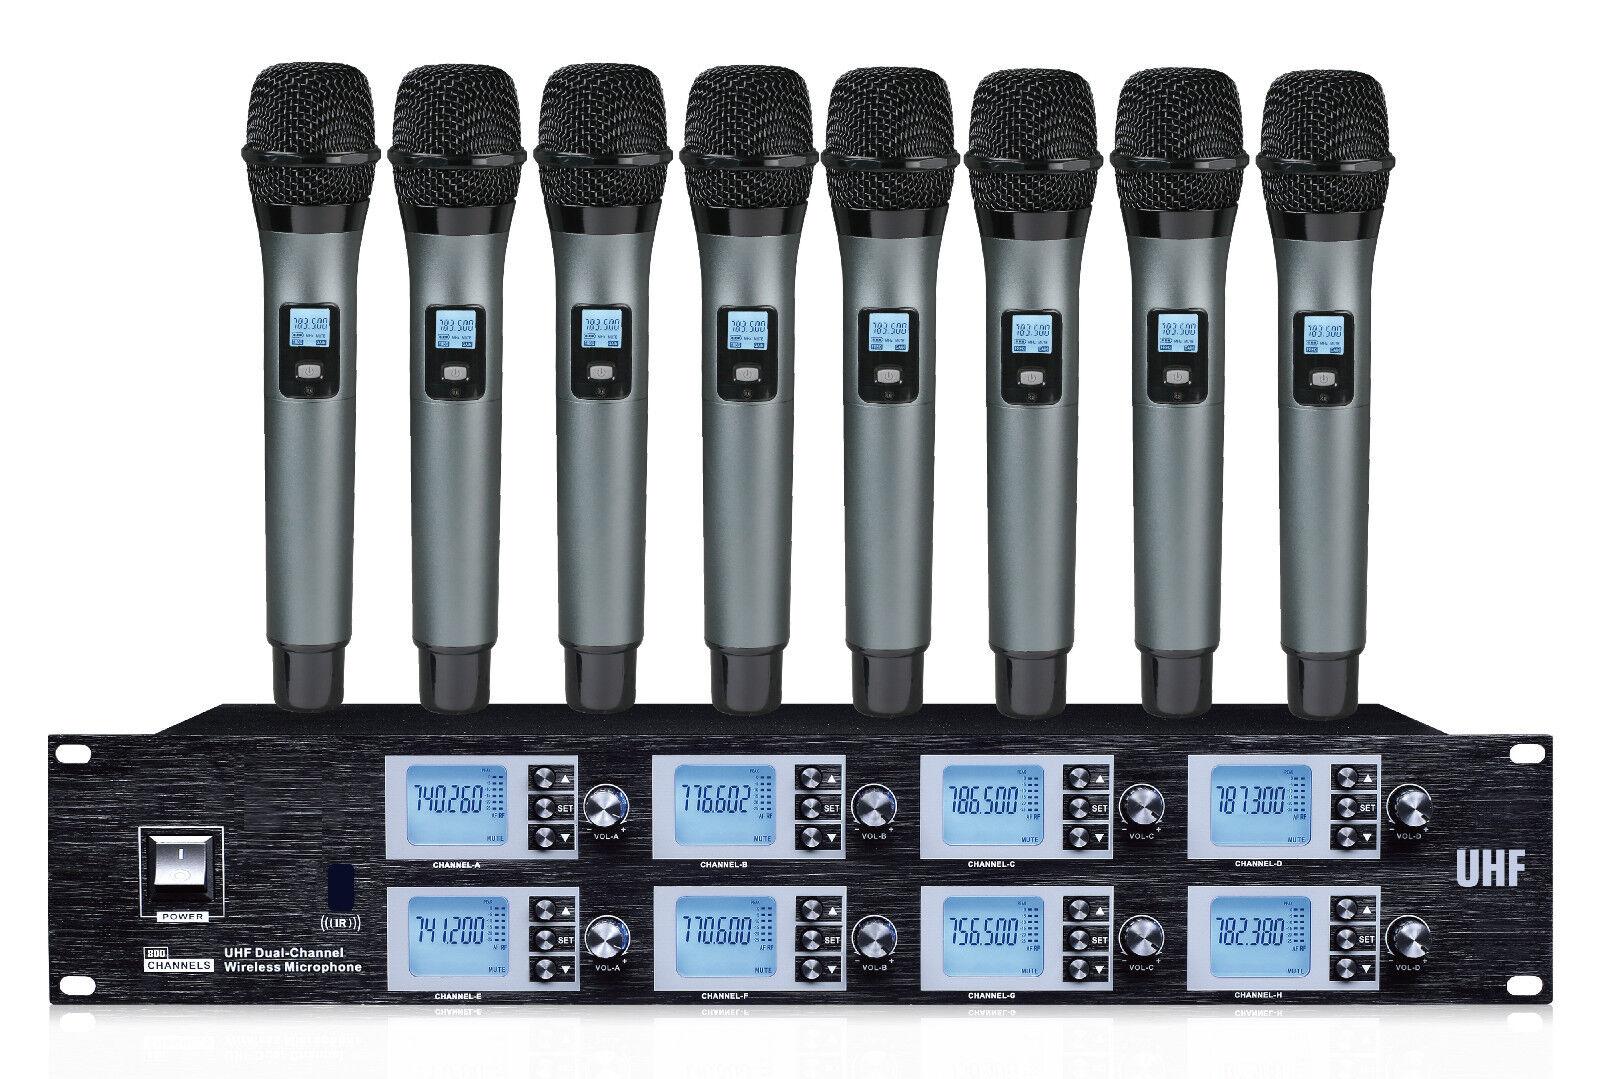 8 Channels UHF Wireless Cordless Microphone mic System PR-U8800SB